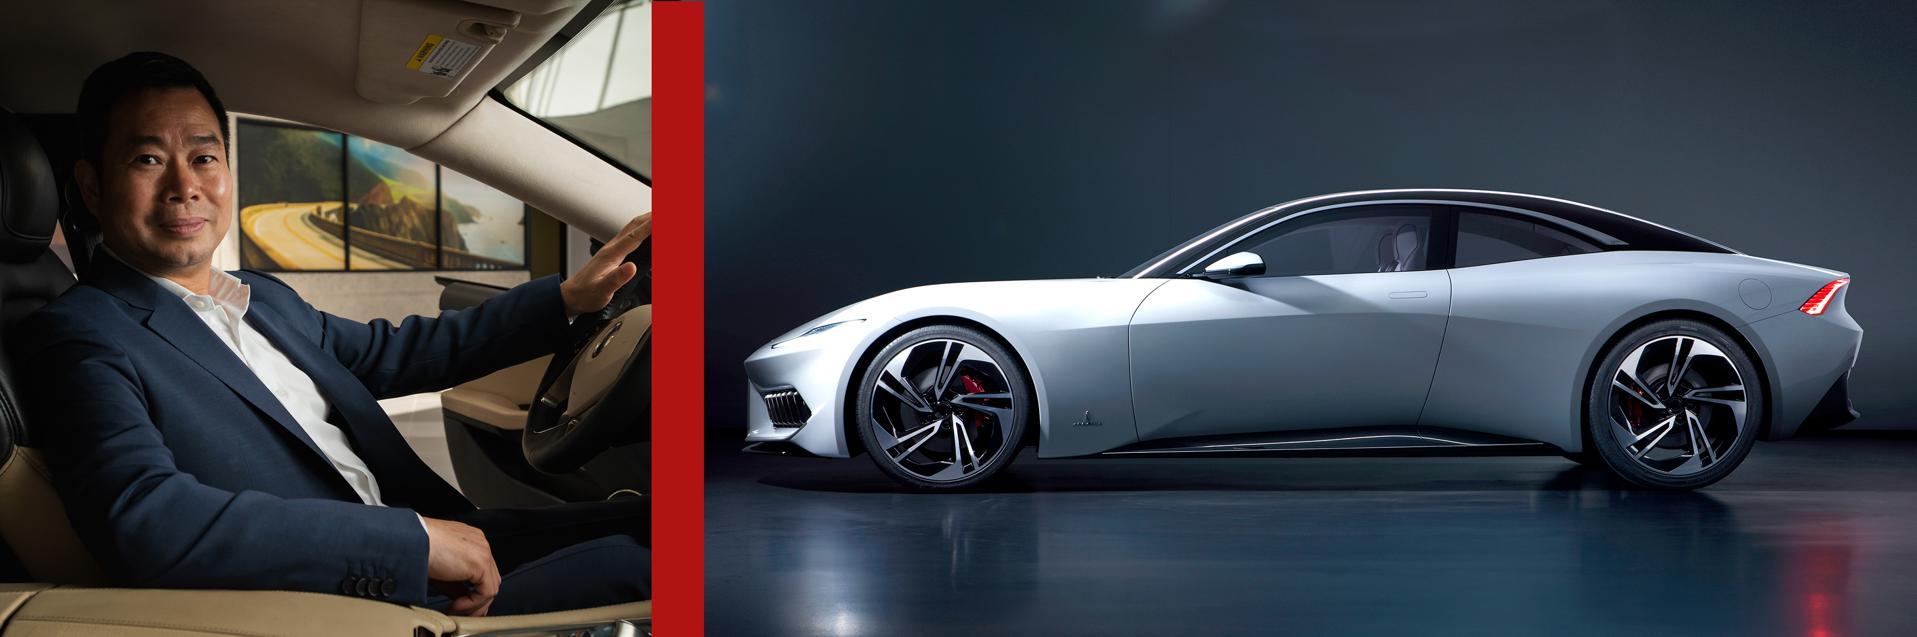 arma GT Designed by Pininfarina